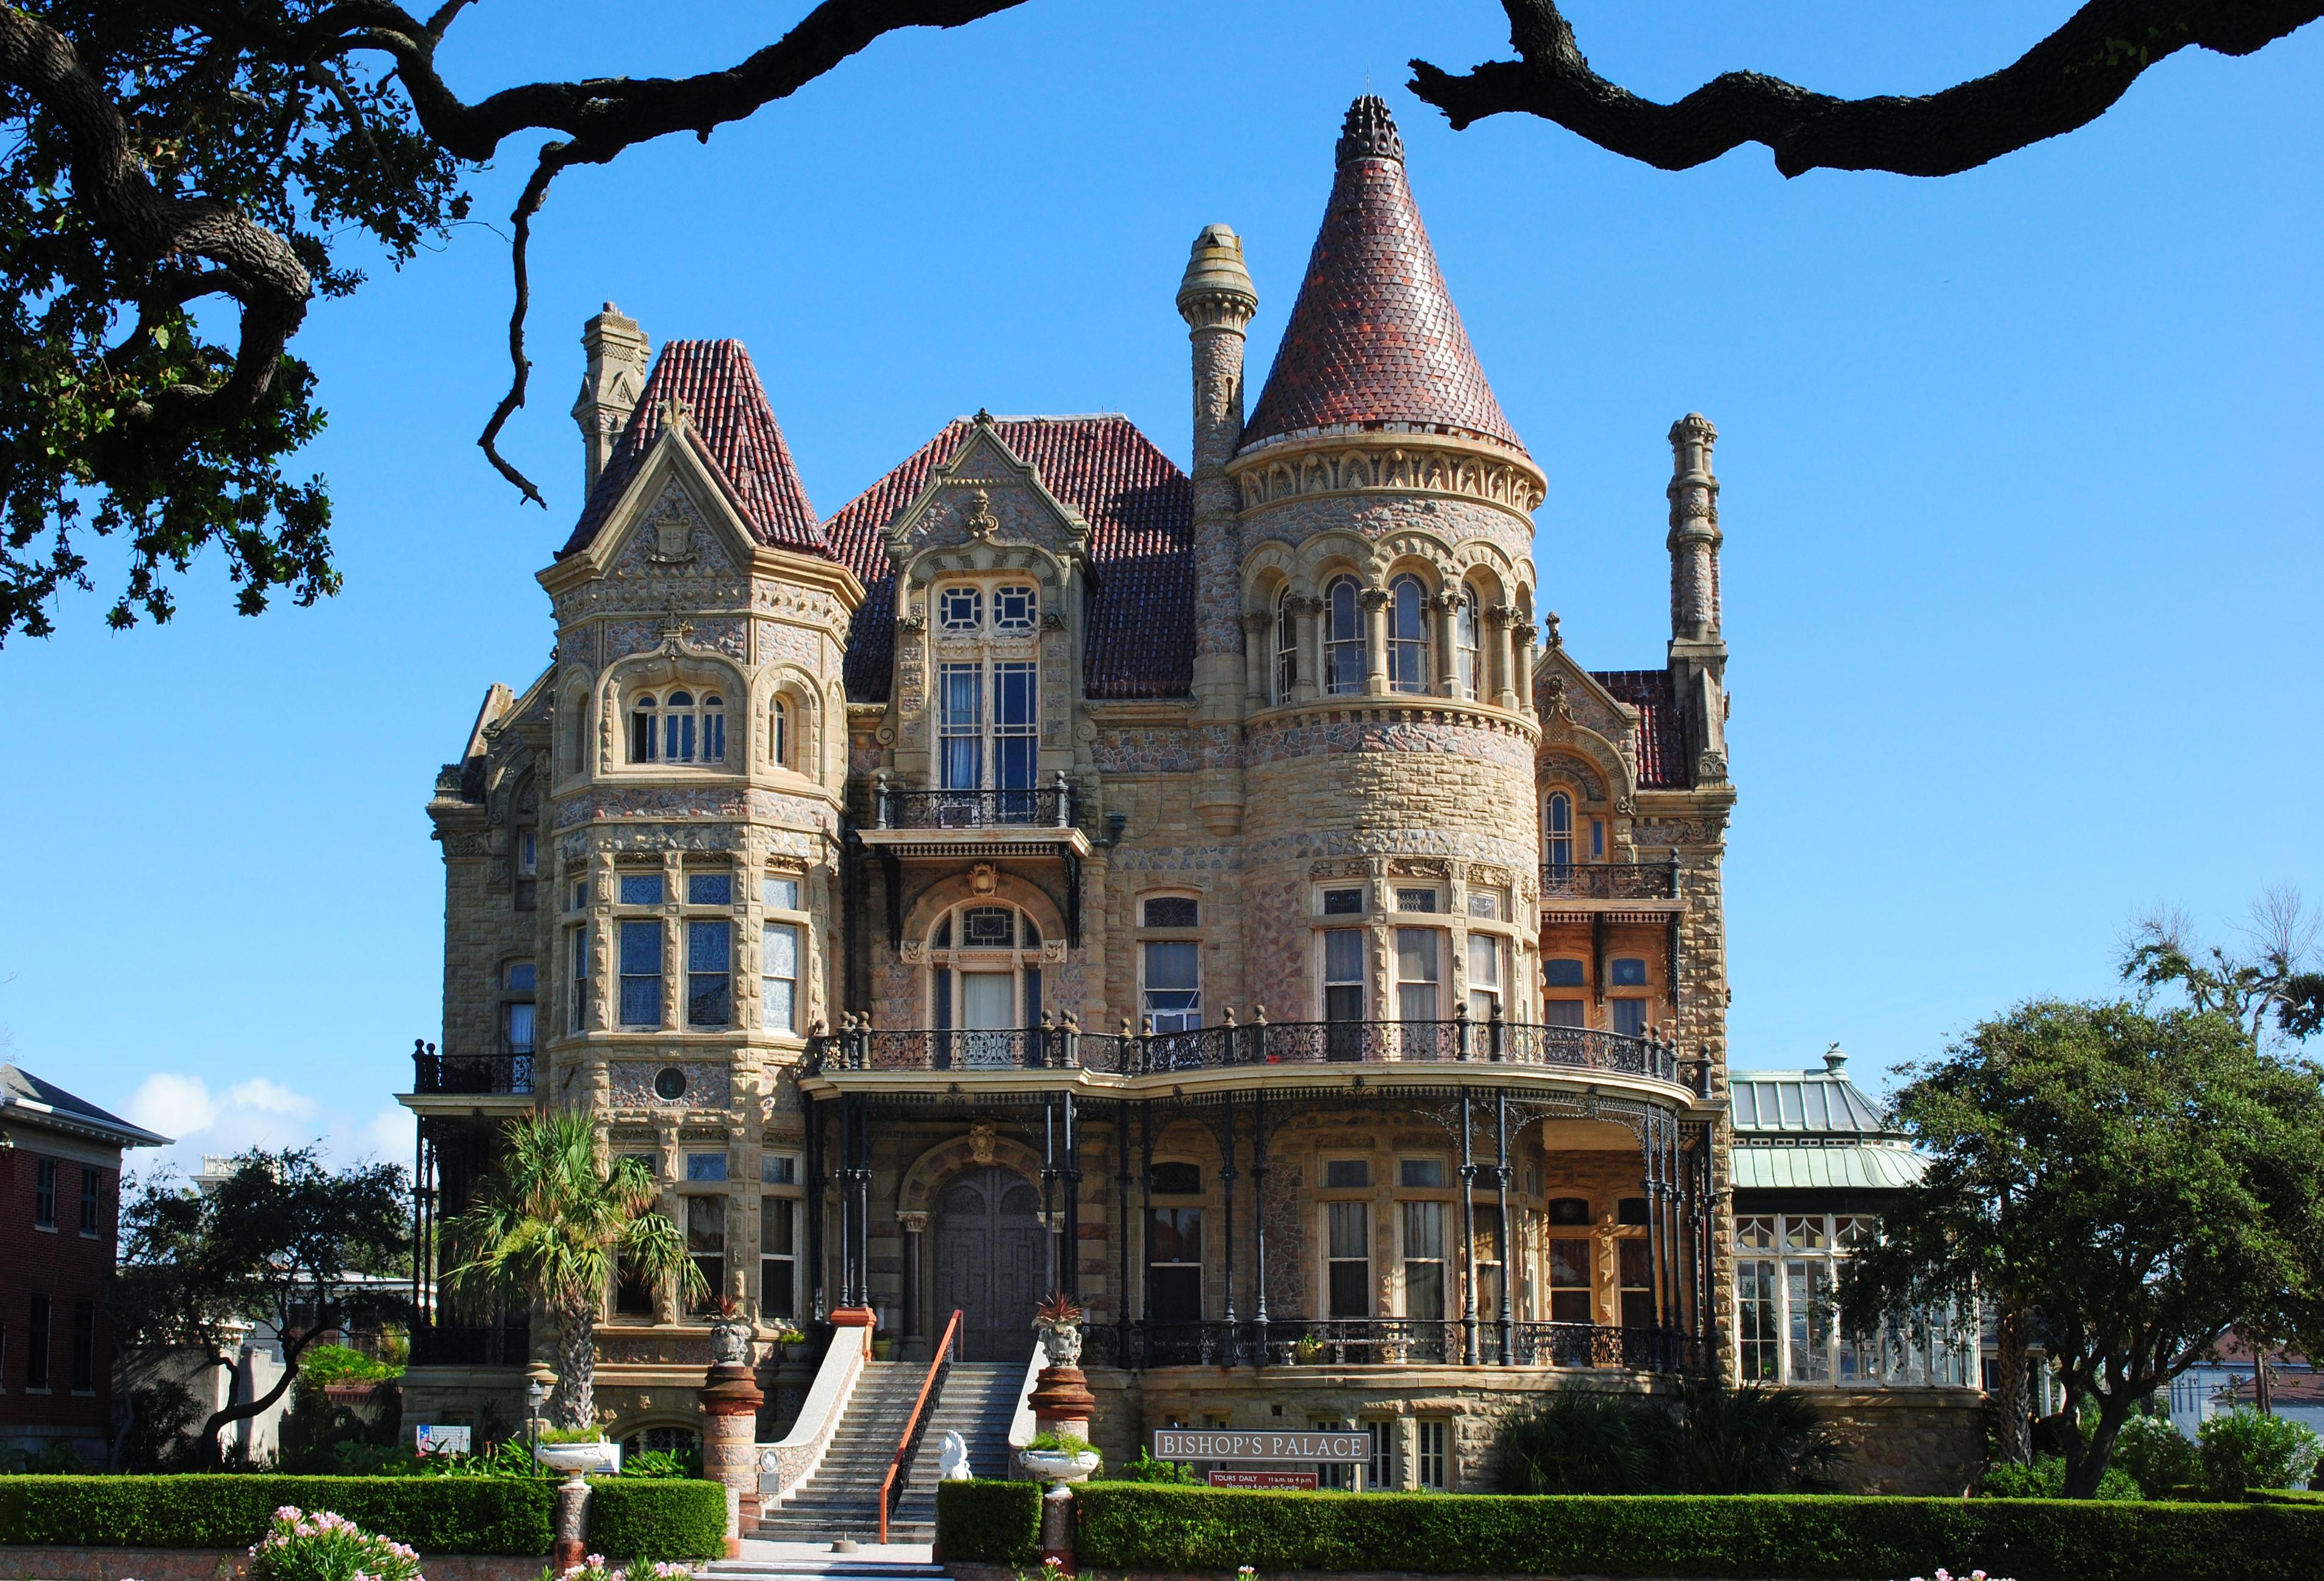 Vanderbilt Castle Long Island